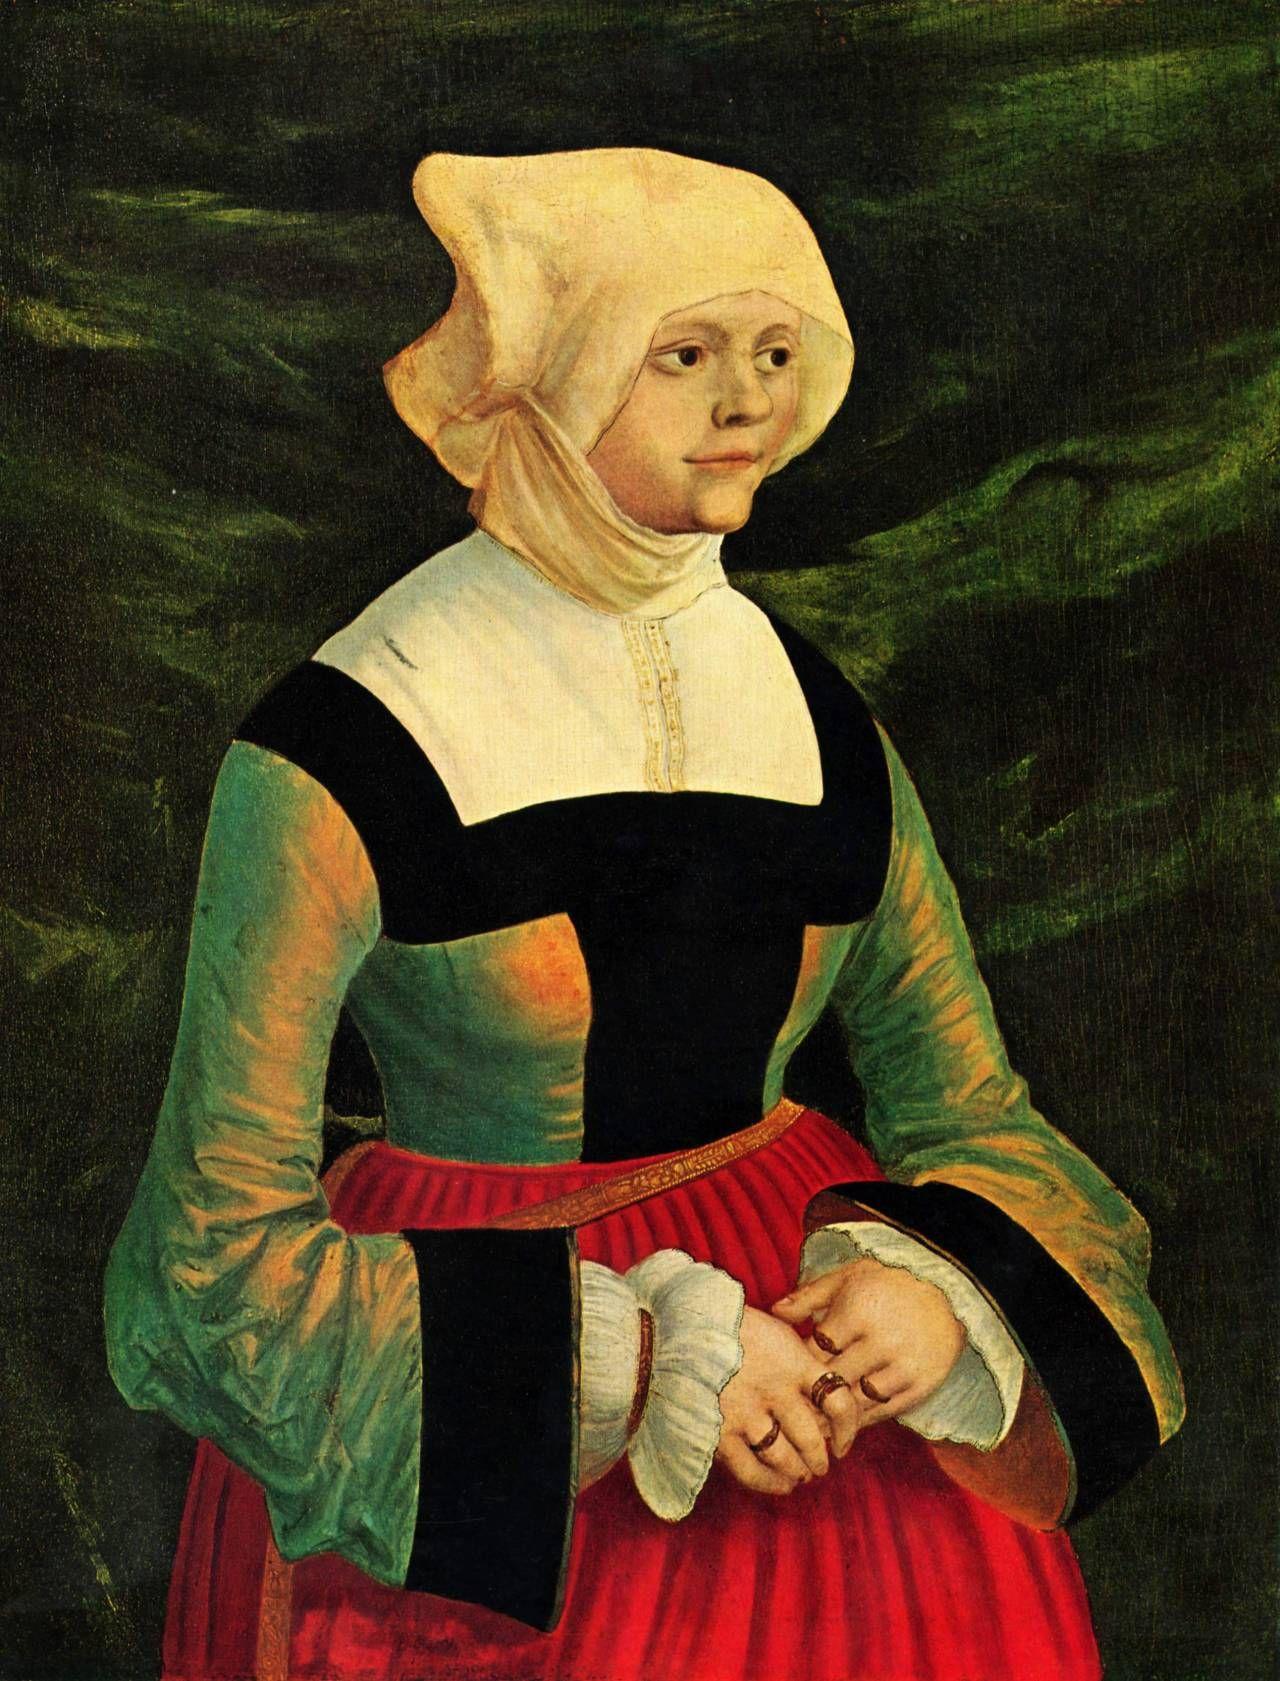 History of fashion — 1525-1530 Albrecht Altdorfer - Portrait of a woman